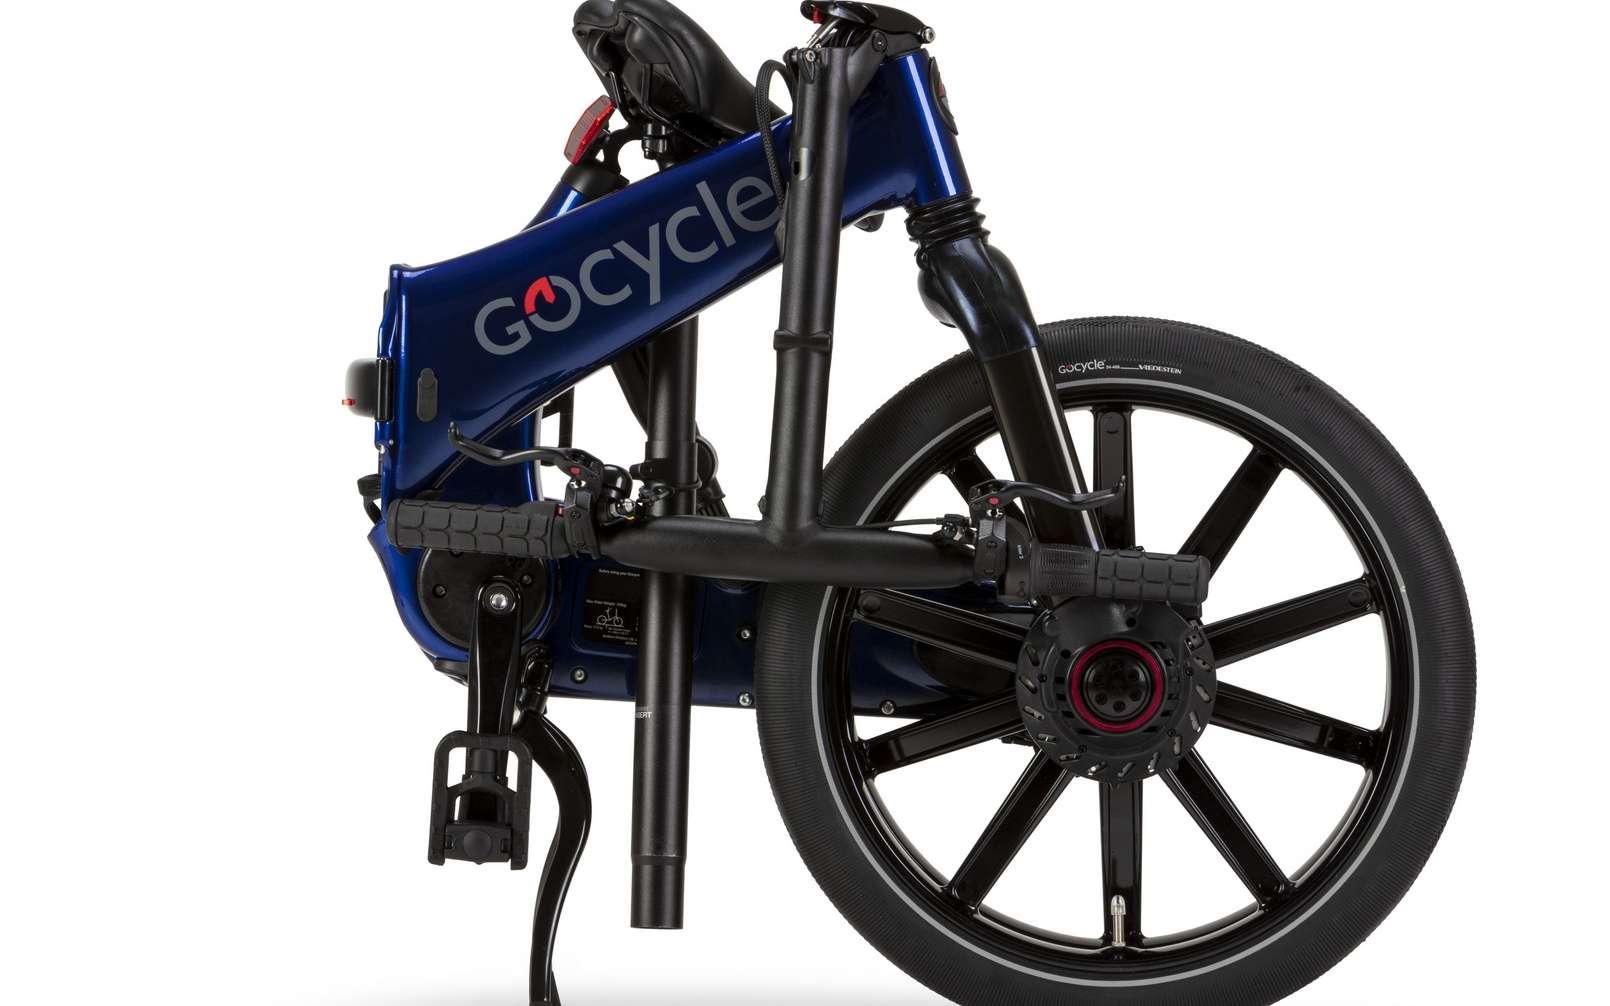 Le nouveau GoCycle GX 2020. © GoCycle